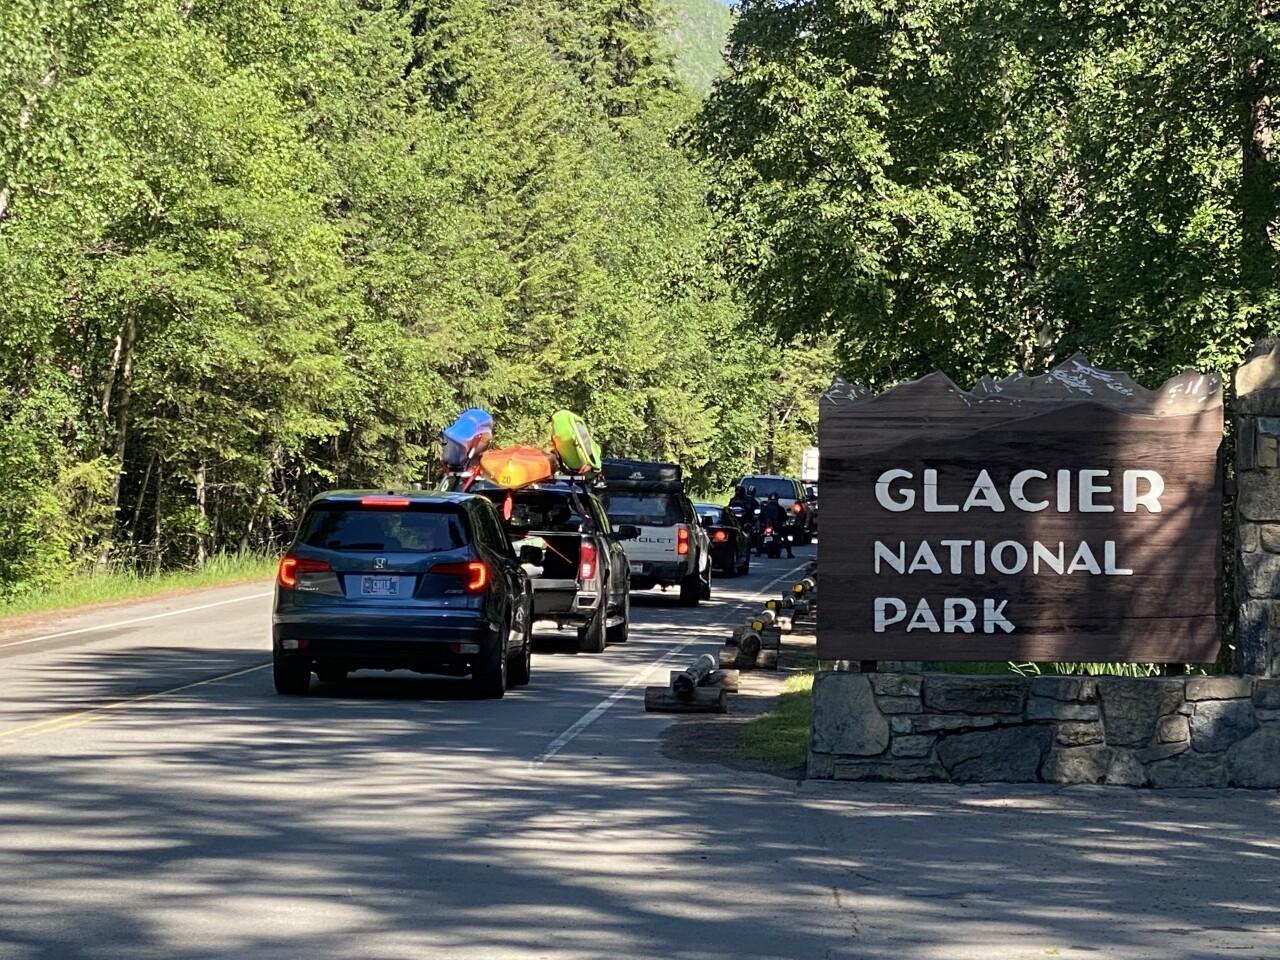 Glacier National Park Sun Road Opening